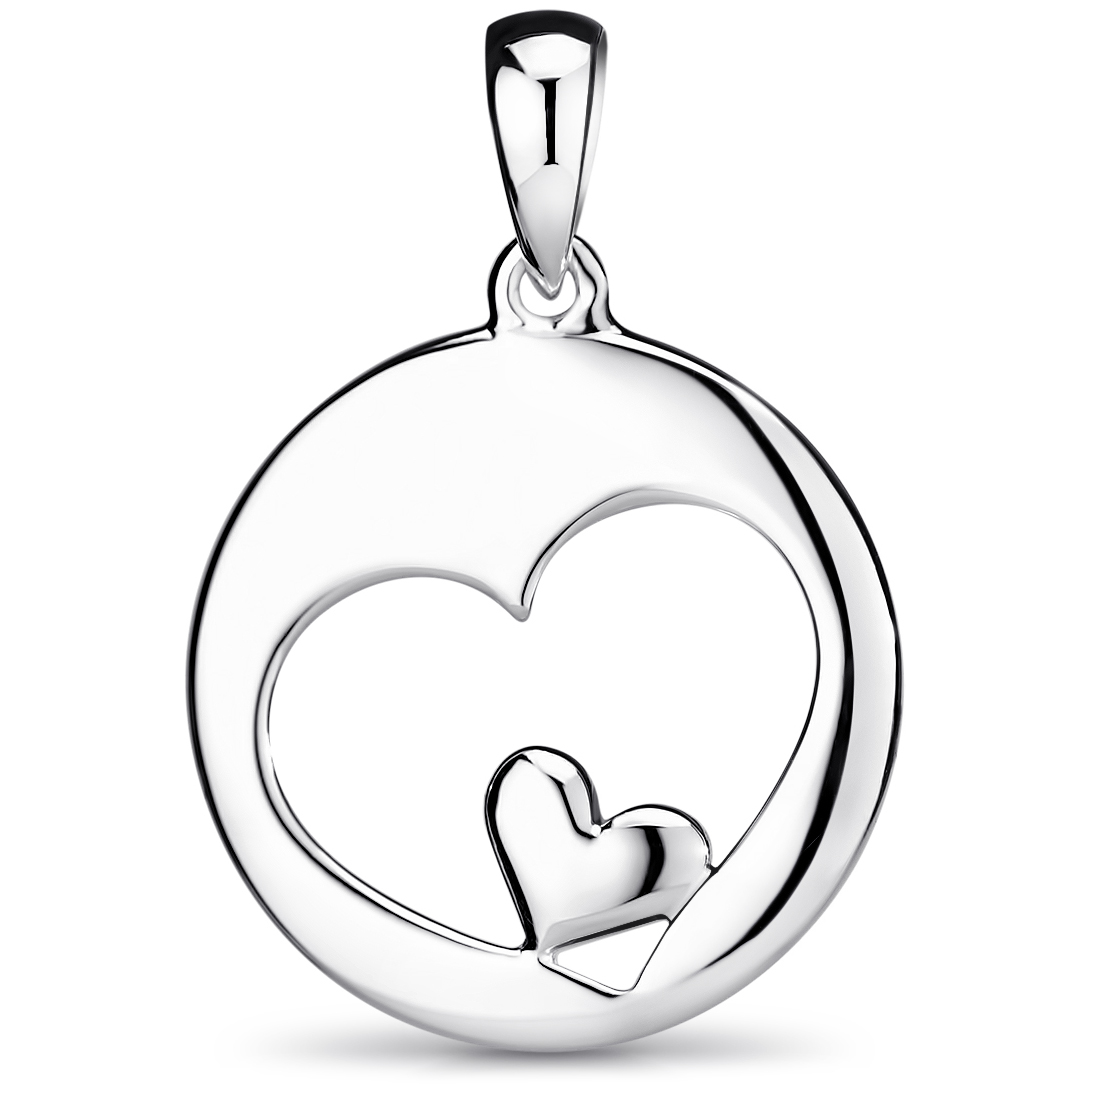 Zirkonia Anhänger weiß MATERIA Damen Kettenhänger Herz Silber 925 gebürstet